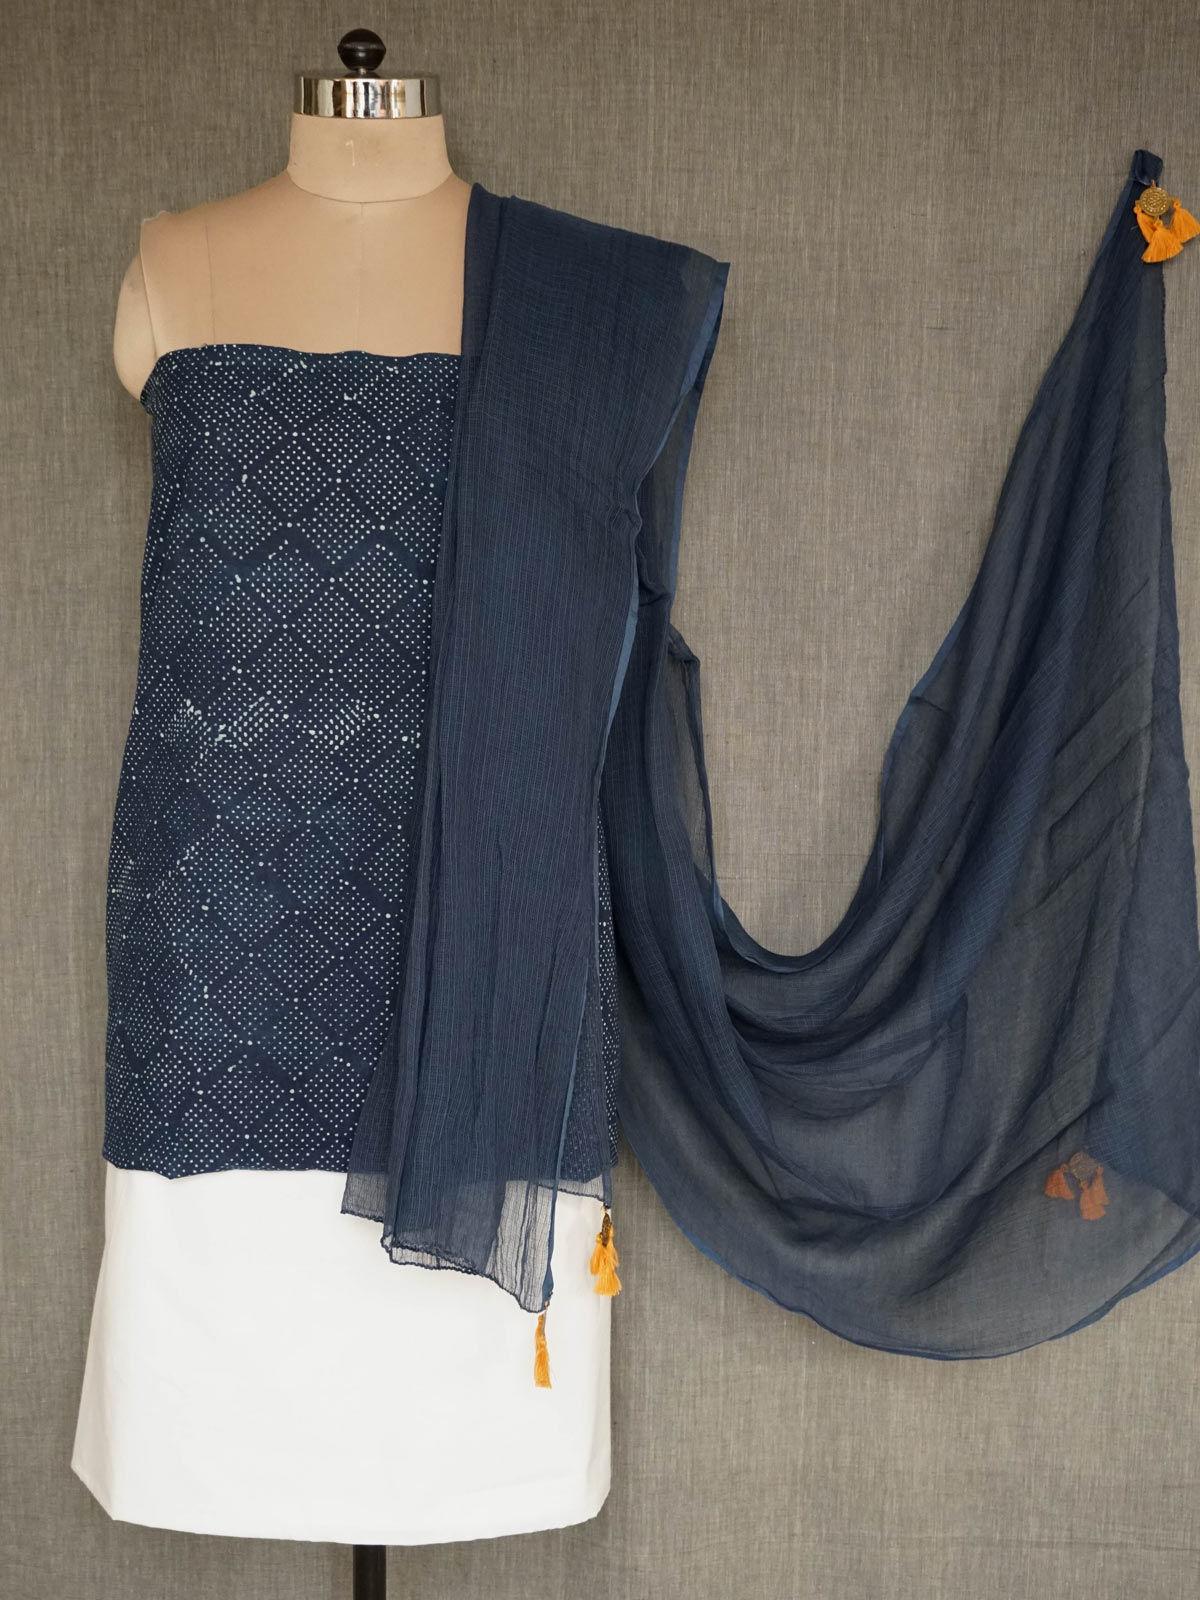 Indigo printed cotton dress material with dupatta